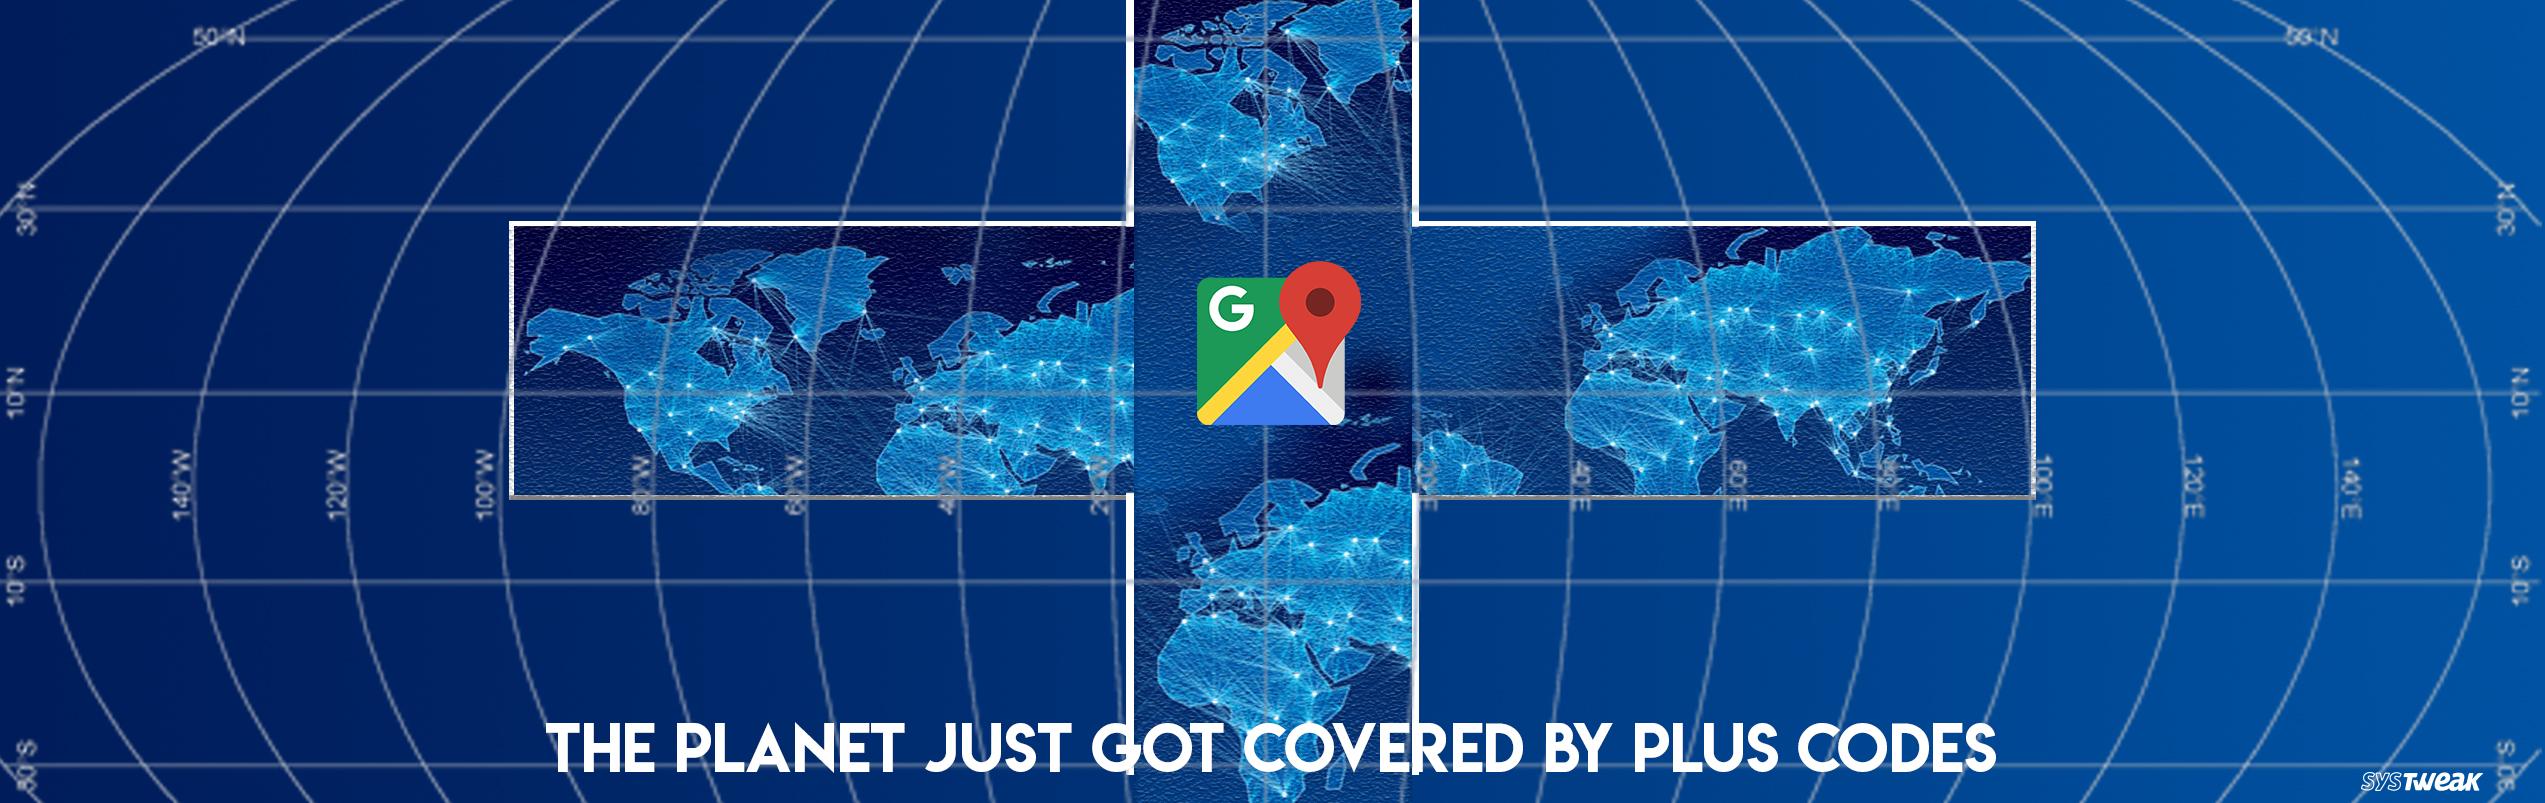 Google Plus Codes: A Remarkable Advancement In Navigation